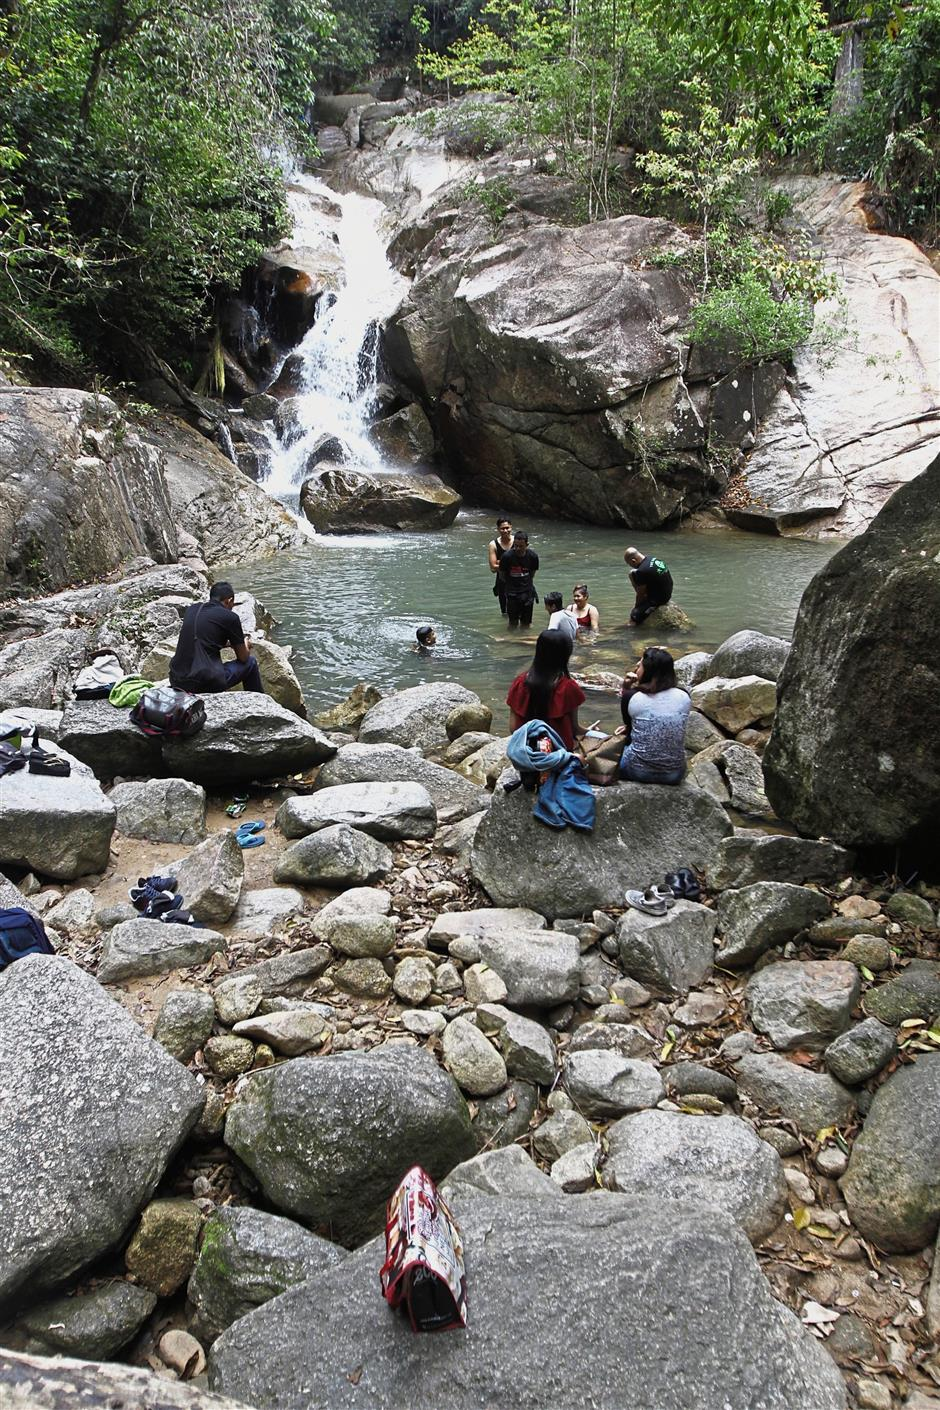 Picnickers taking a dip at the Titi Kerawang waterfalls.